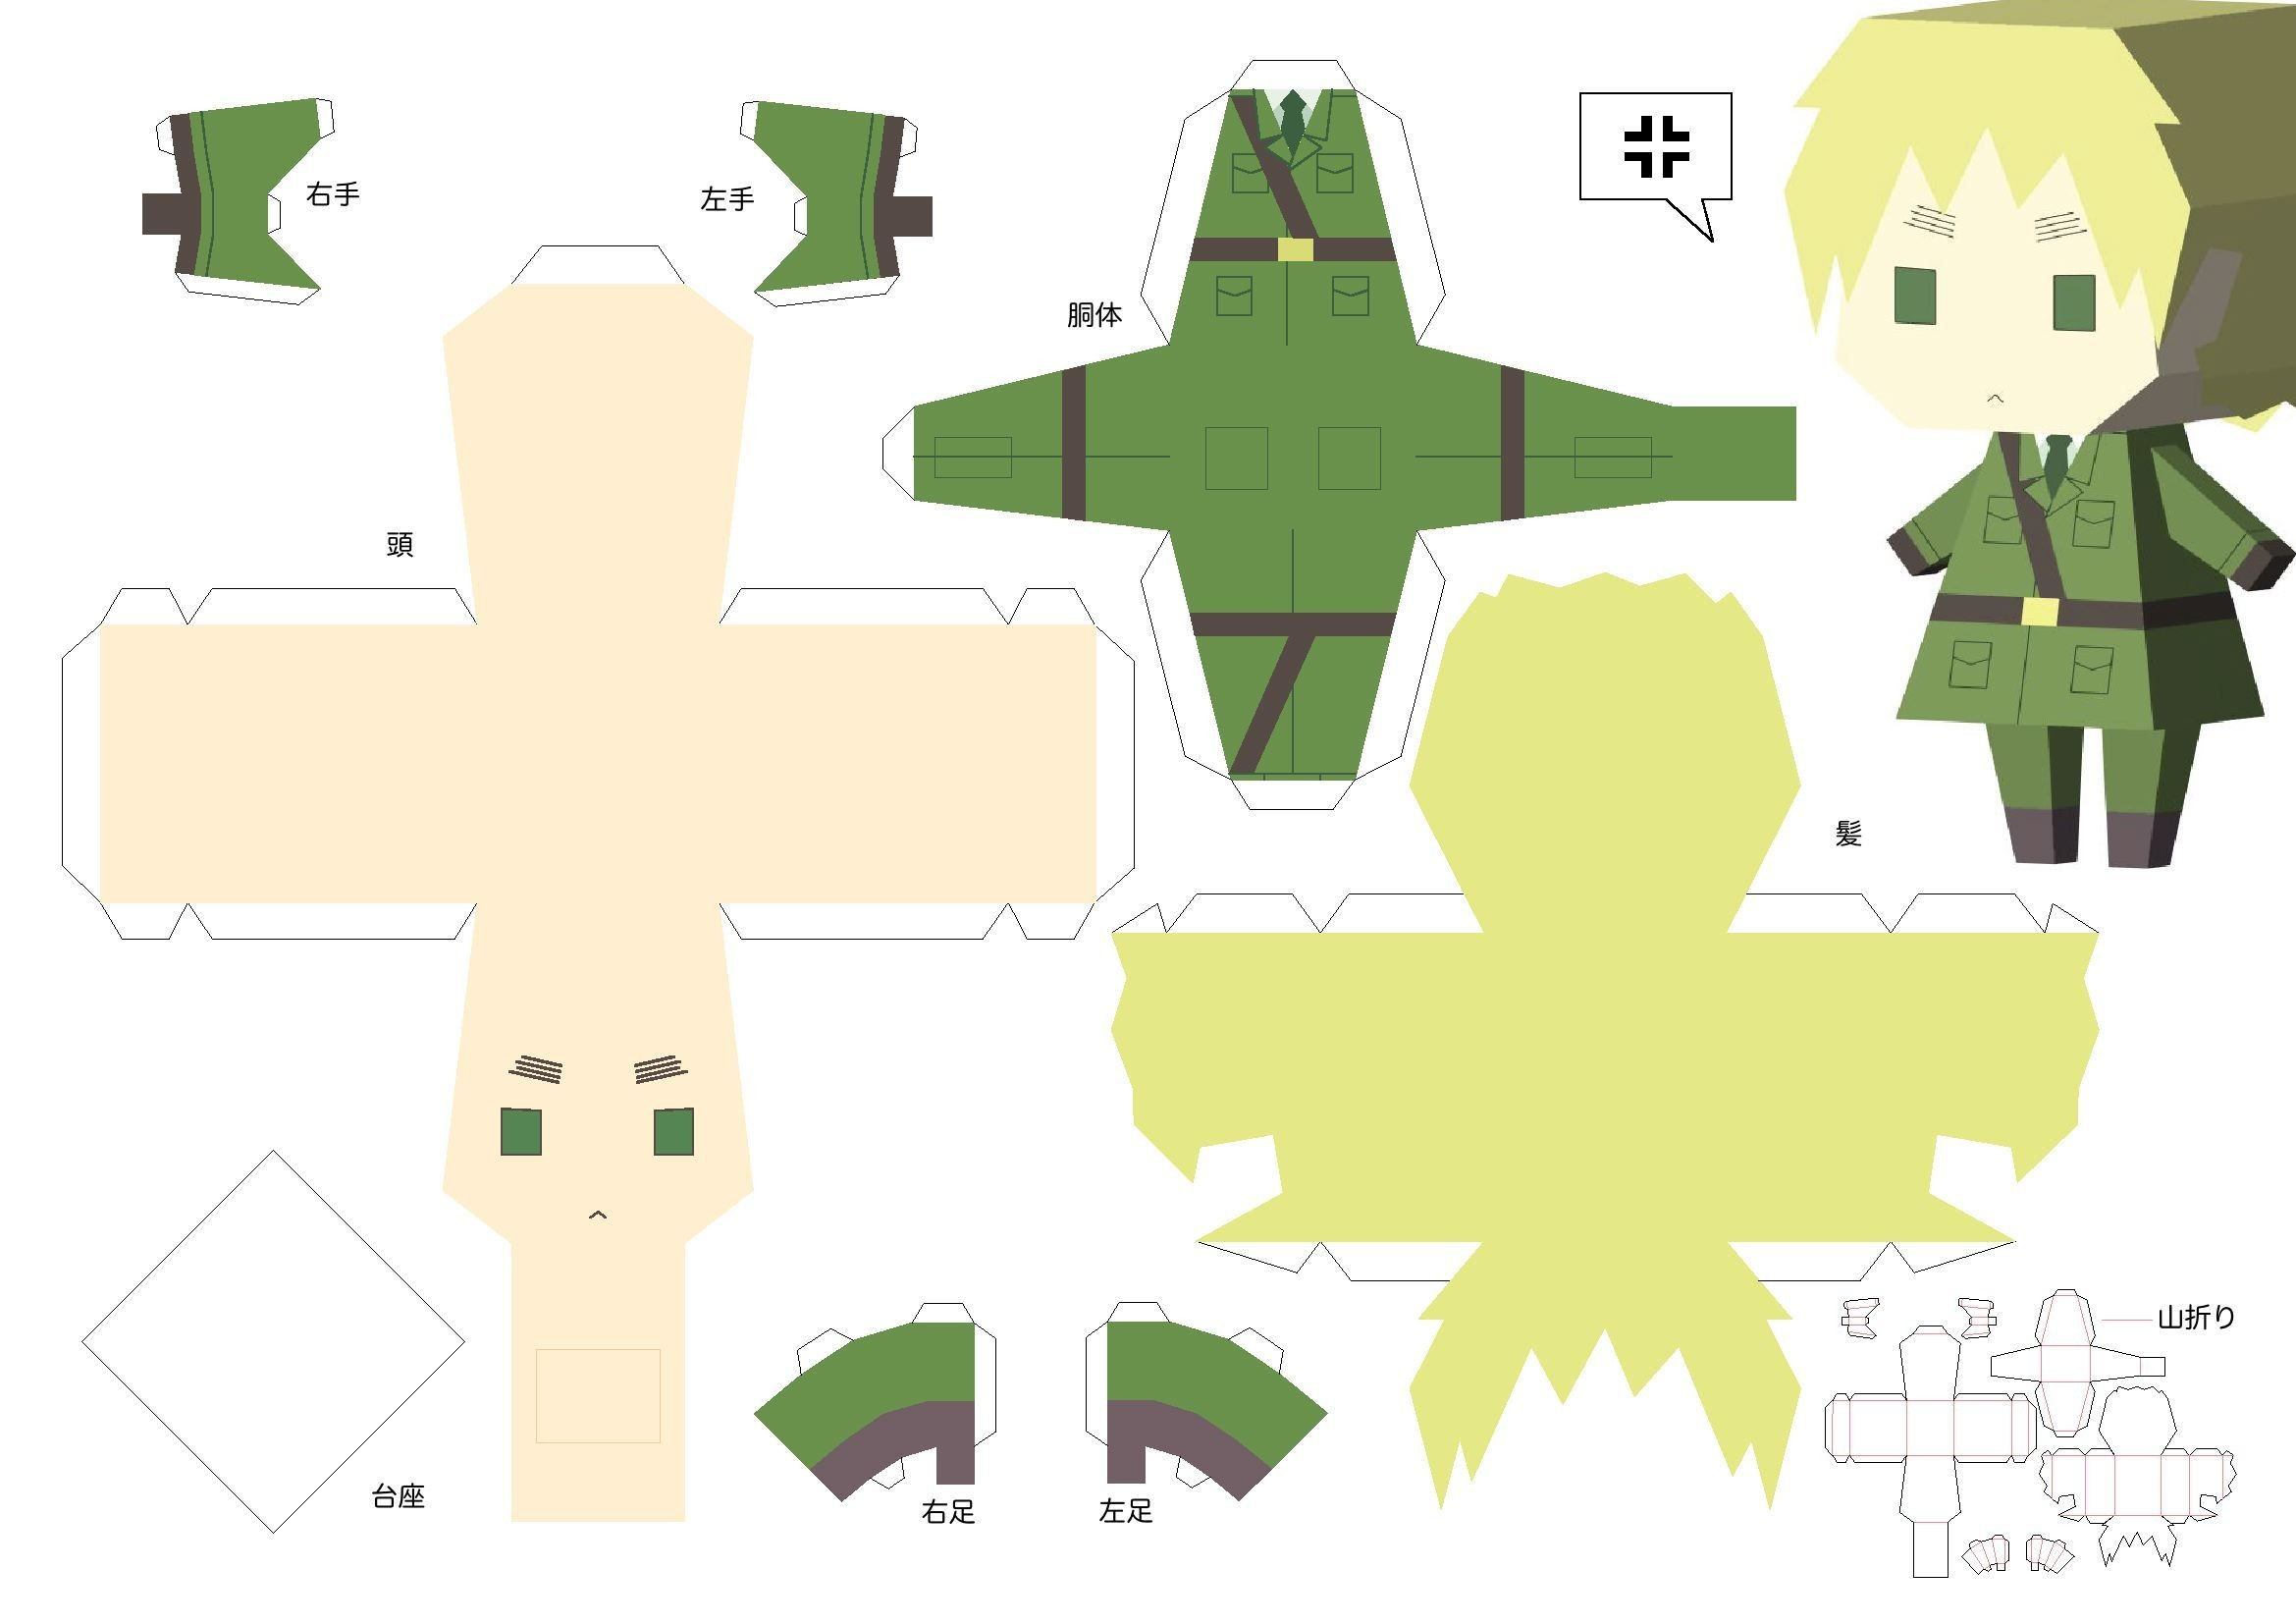 Hetalia Papercraft Japan Hetalia ♥ Papercraft Pinterest